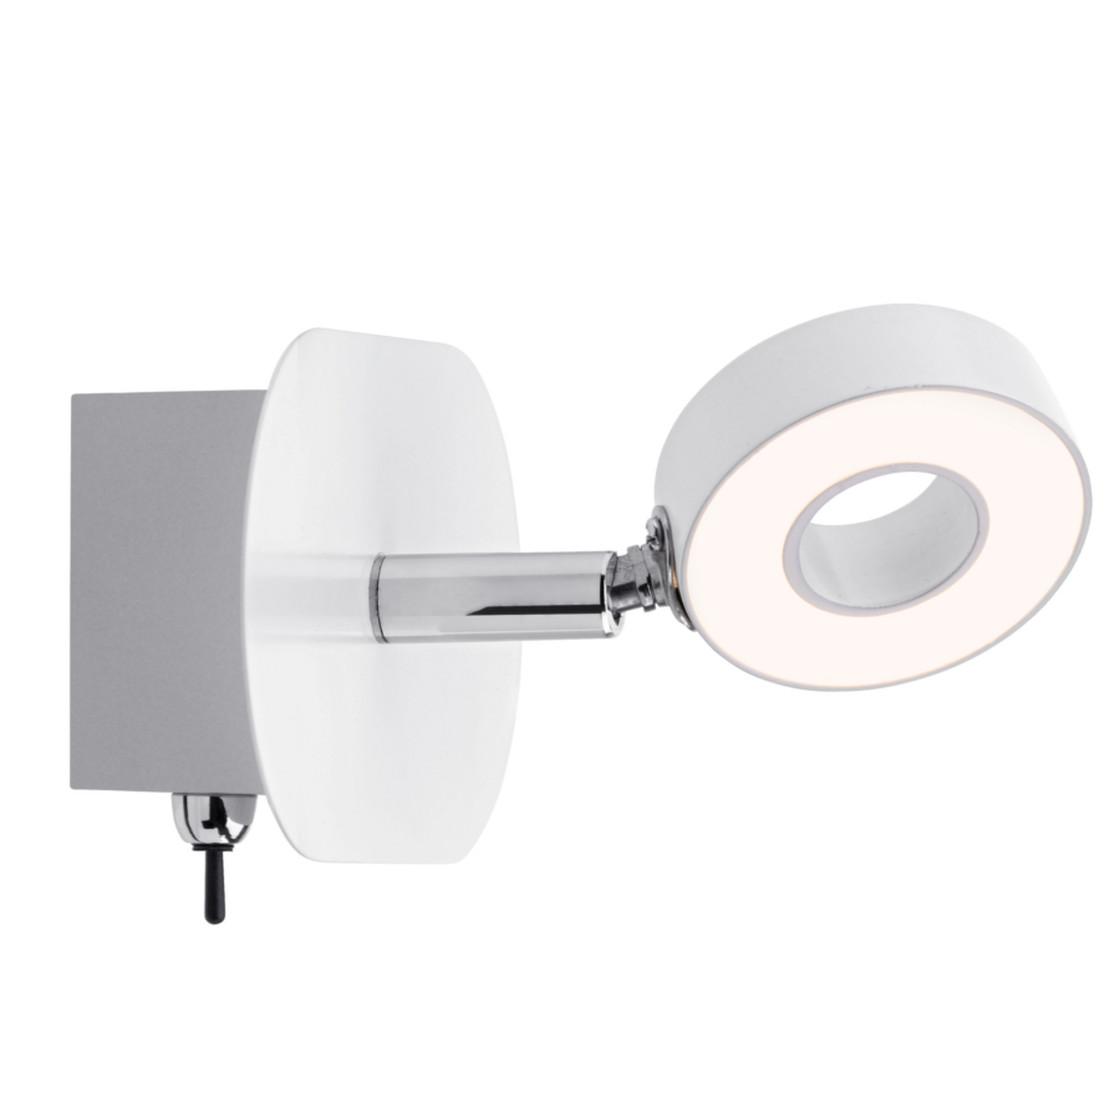 Paulmann led wandleuchte inspiration f r for Lampen rampe